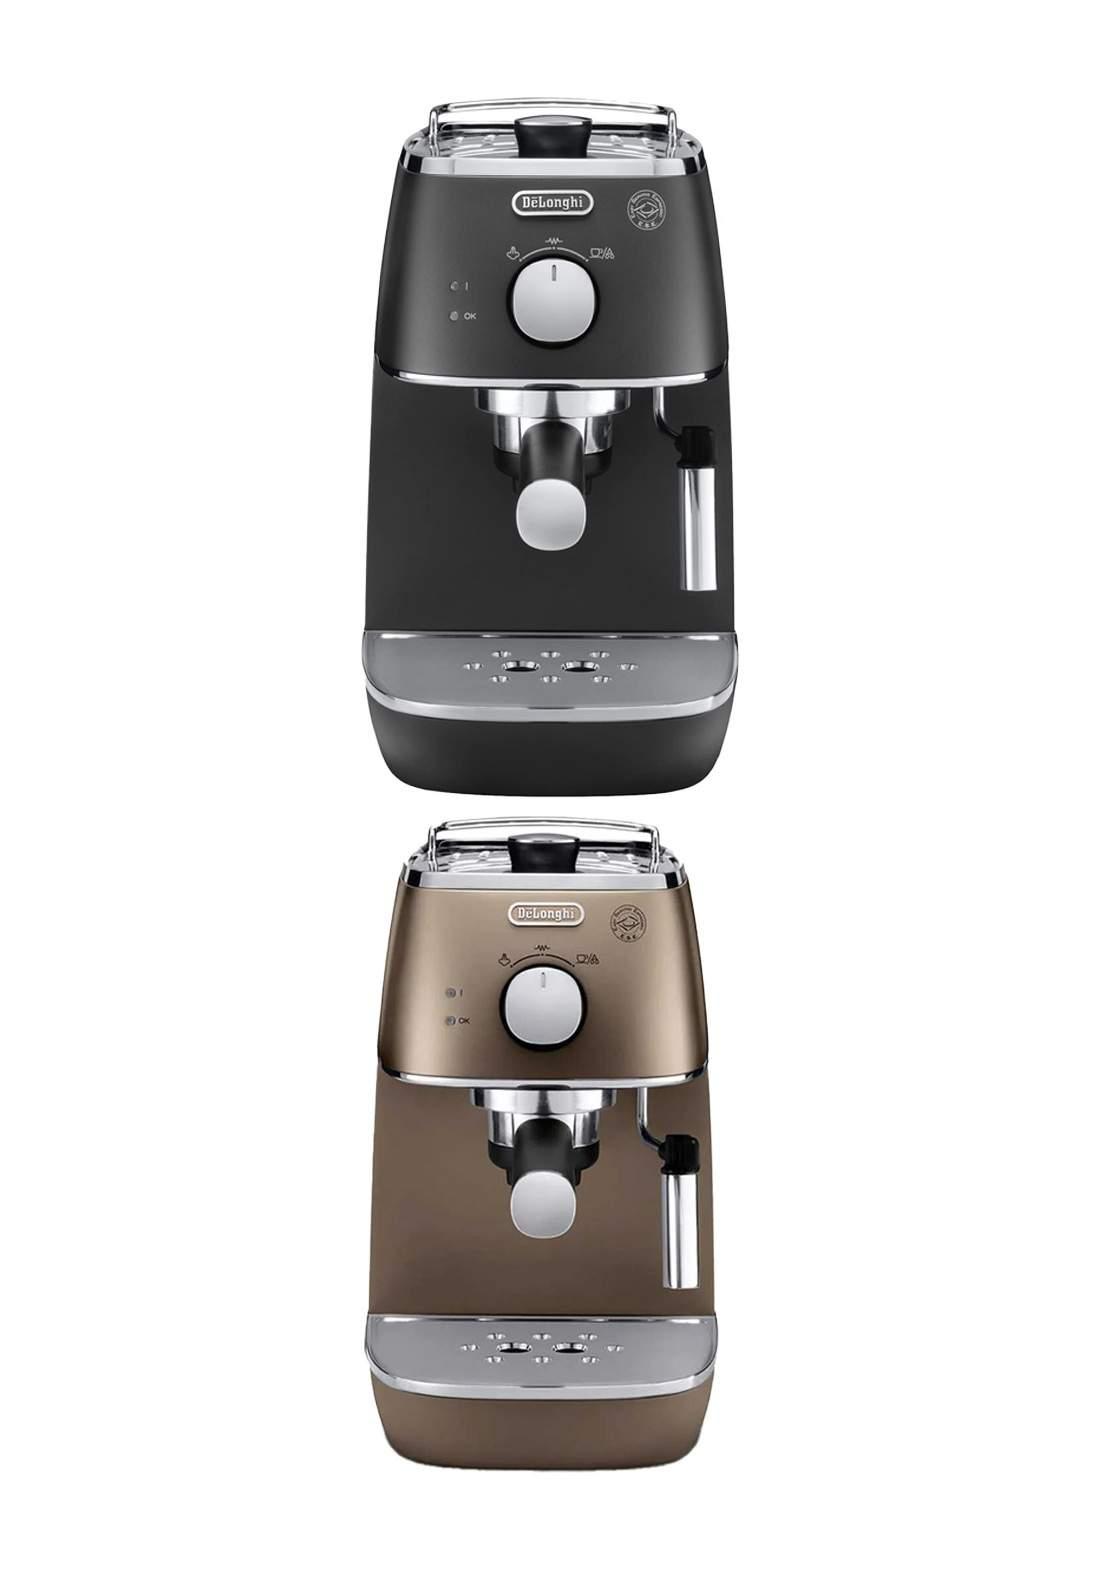 Delonghi ECL341.CP Coffee Machine 1100 Watt ماكنة صنع قهوة